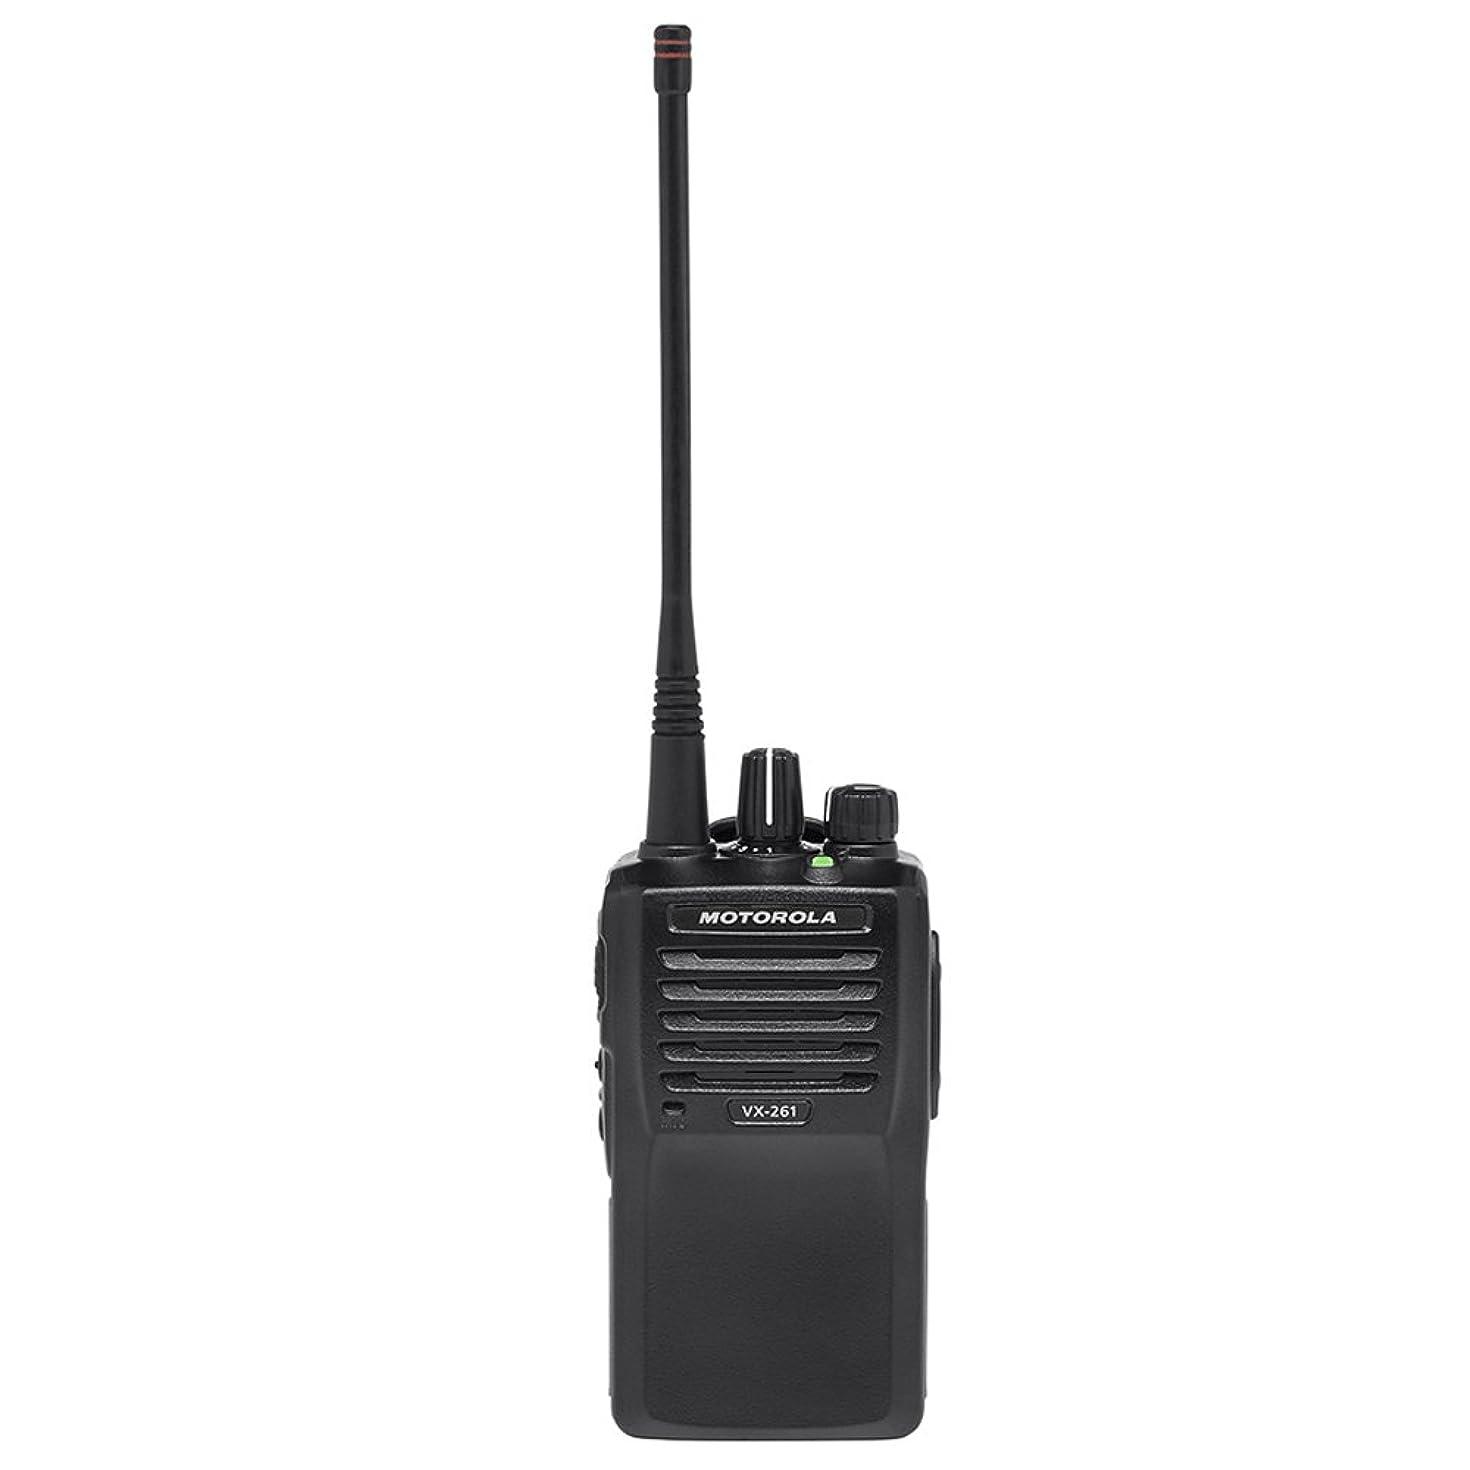 Motorola Original VX-261-G7-5 UHF 450-512 MHz Handheld Two-way Transceiver with High Capacity Battery